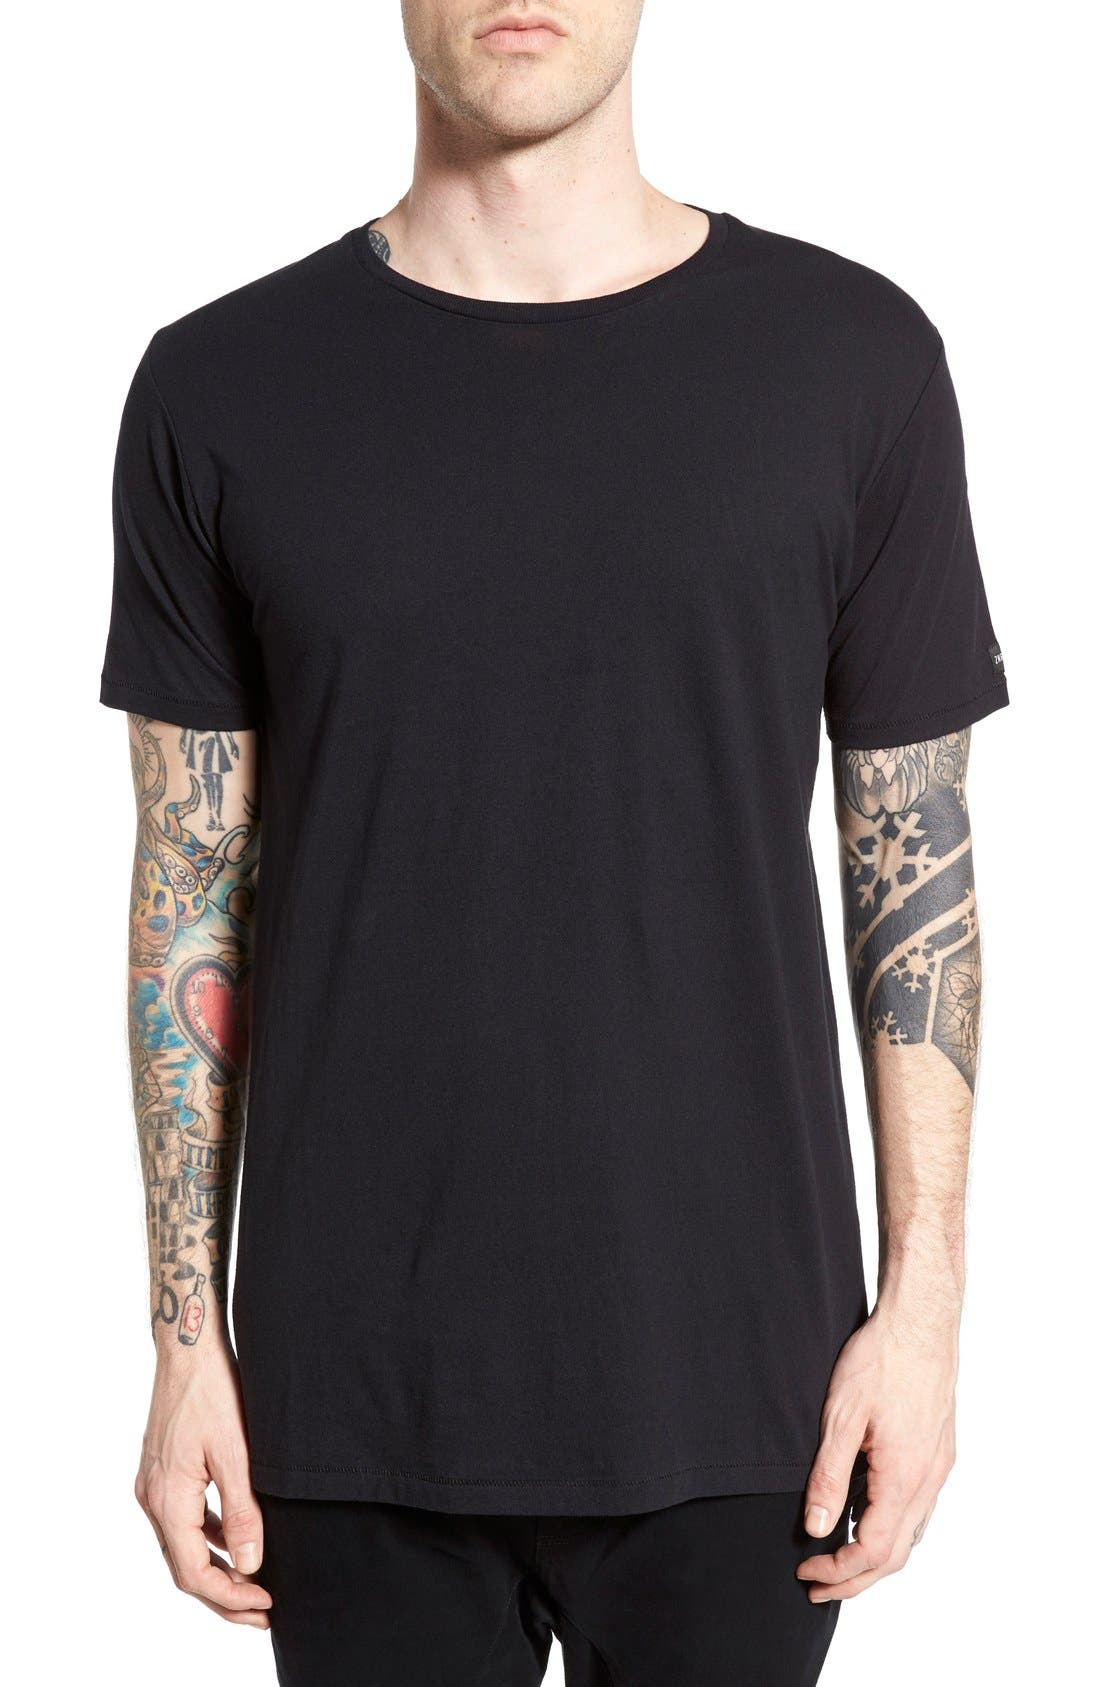 Alternate Image 1 Selected - ZANEROBE 'Flintlock' Longline Crewneck T-Shirt